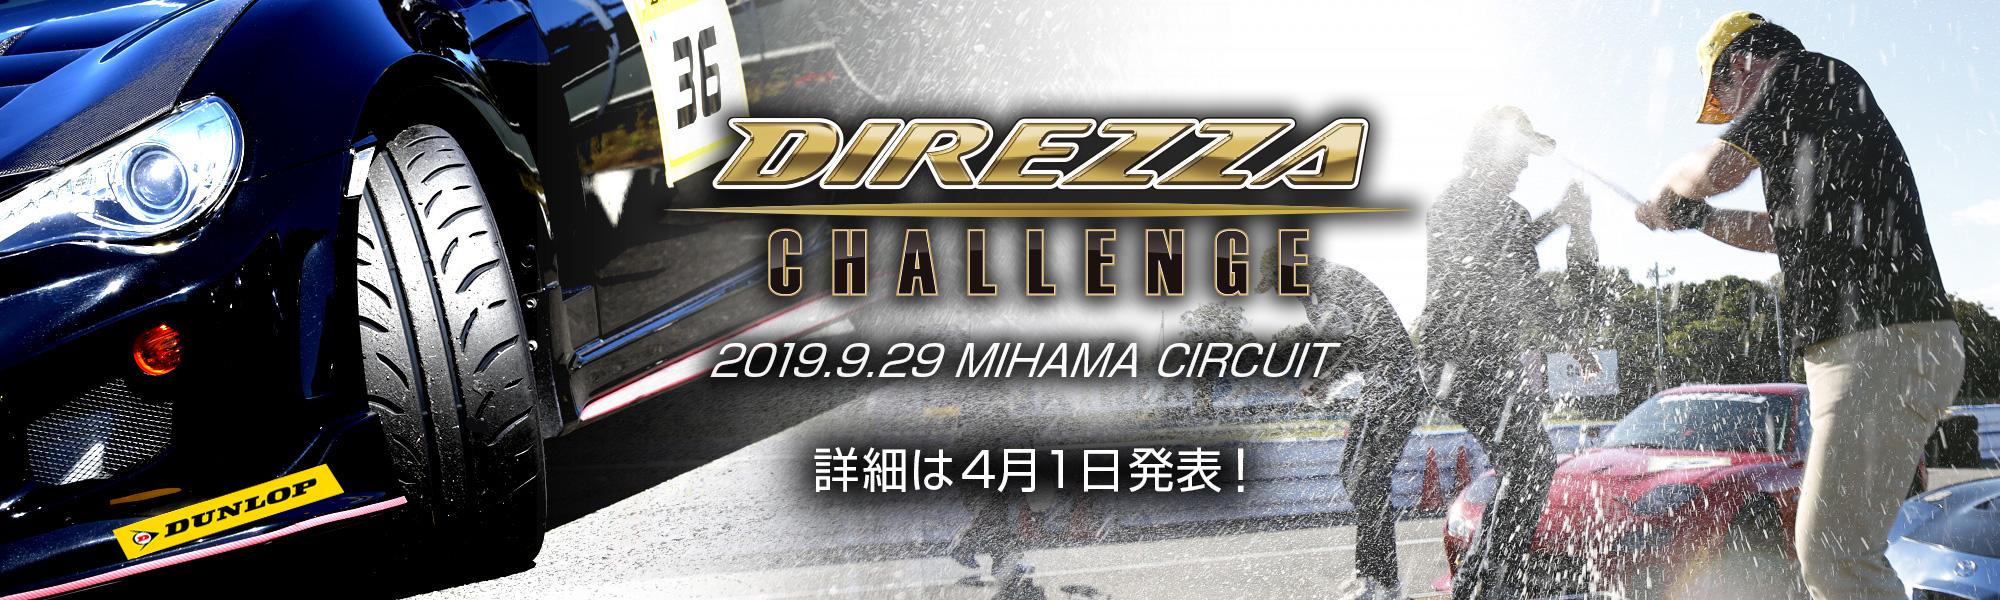 DIREZZA CHALLENGE 2019